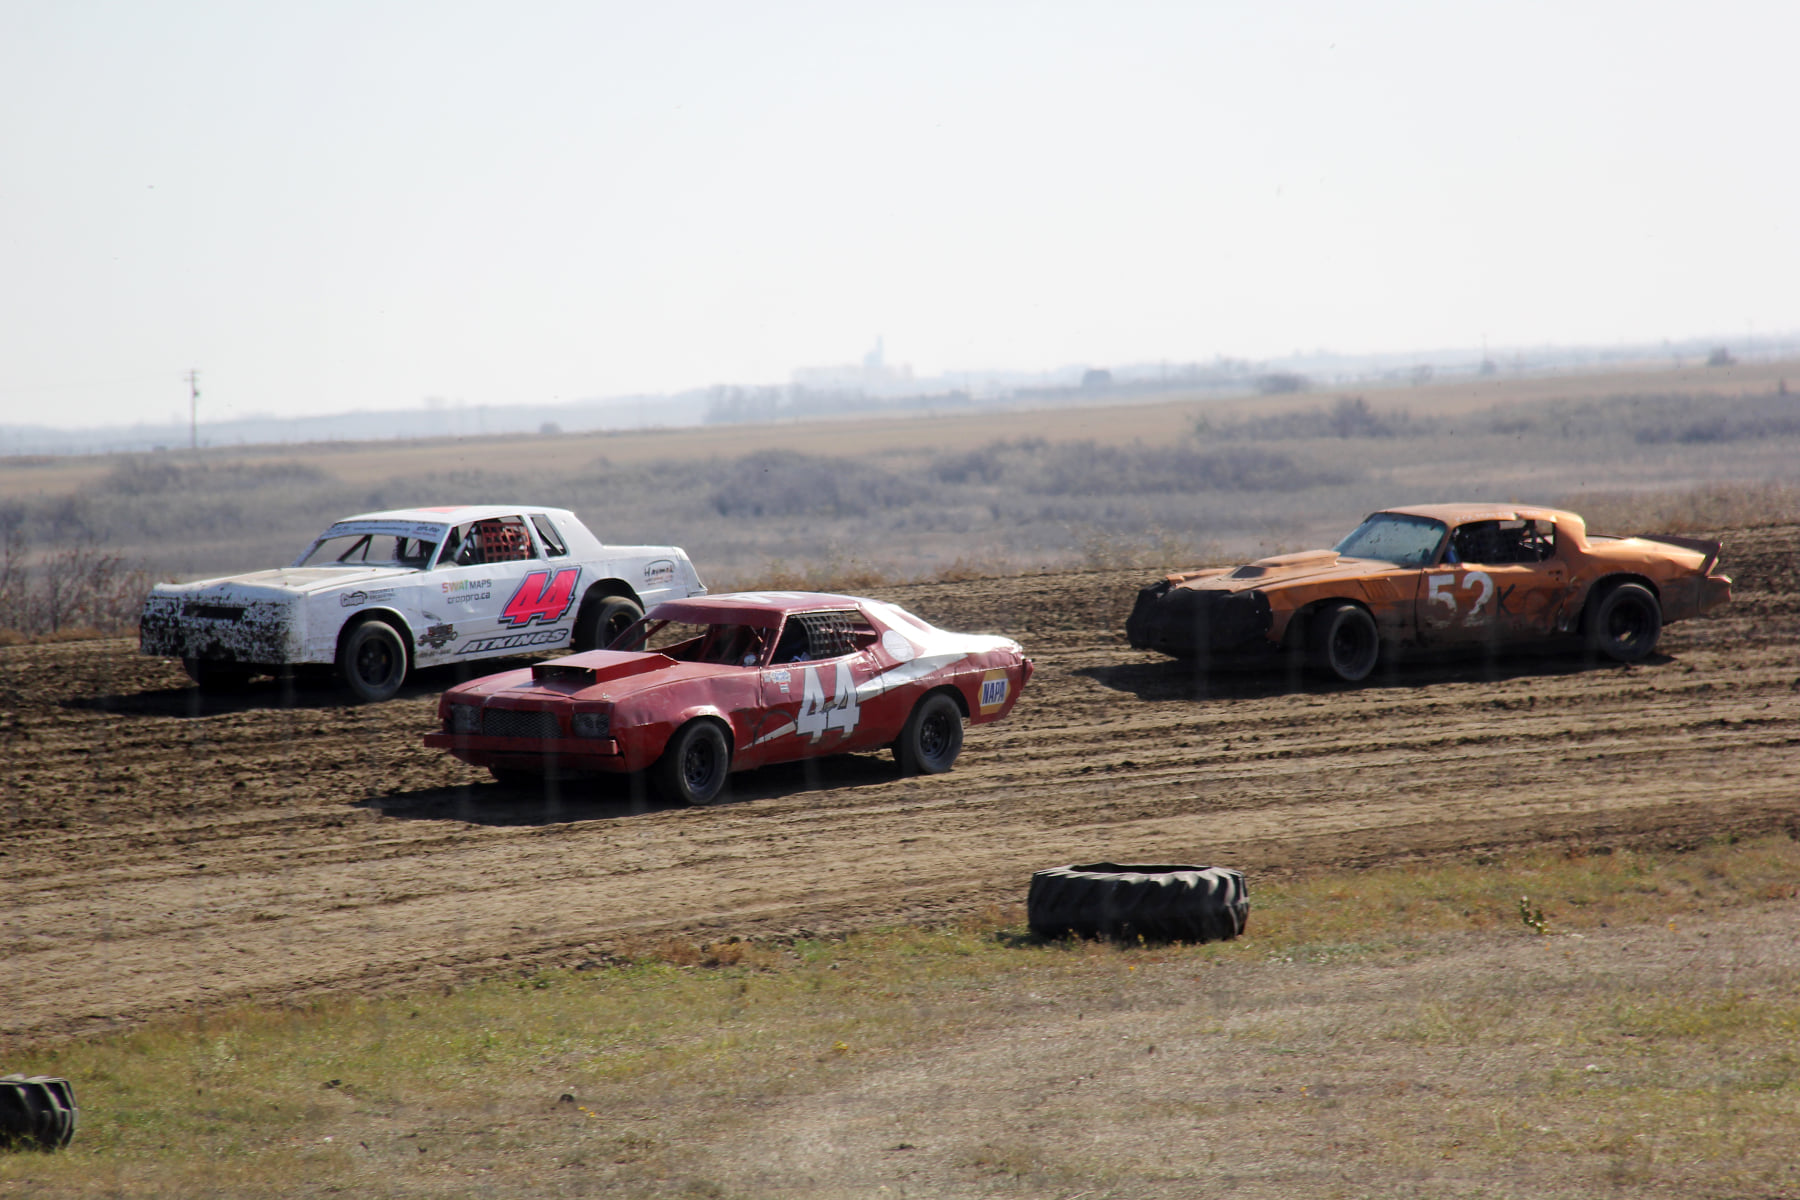 Outlook_Racing_Kemmer_Racing_Photography_2.jpg